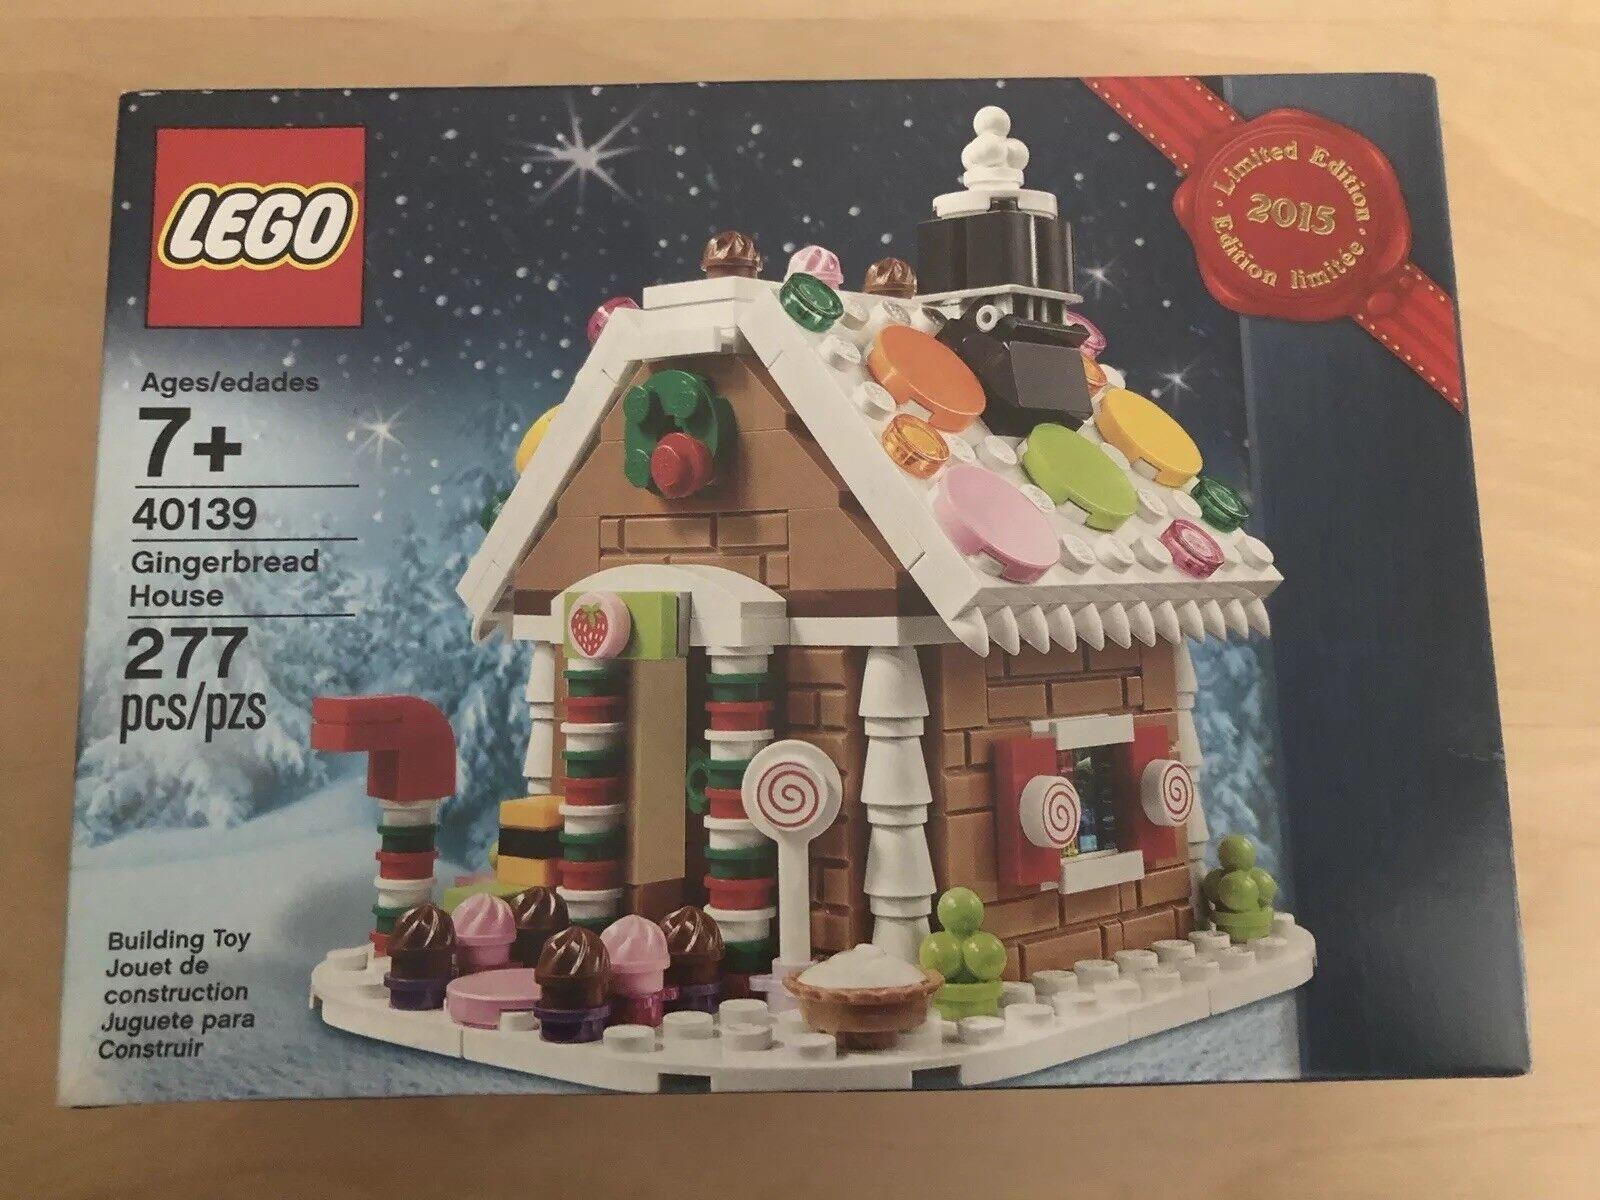 LEGO 40139 Limited Edition 2015 Christmas Gingerbread House Set SEALED Seasonal